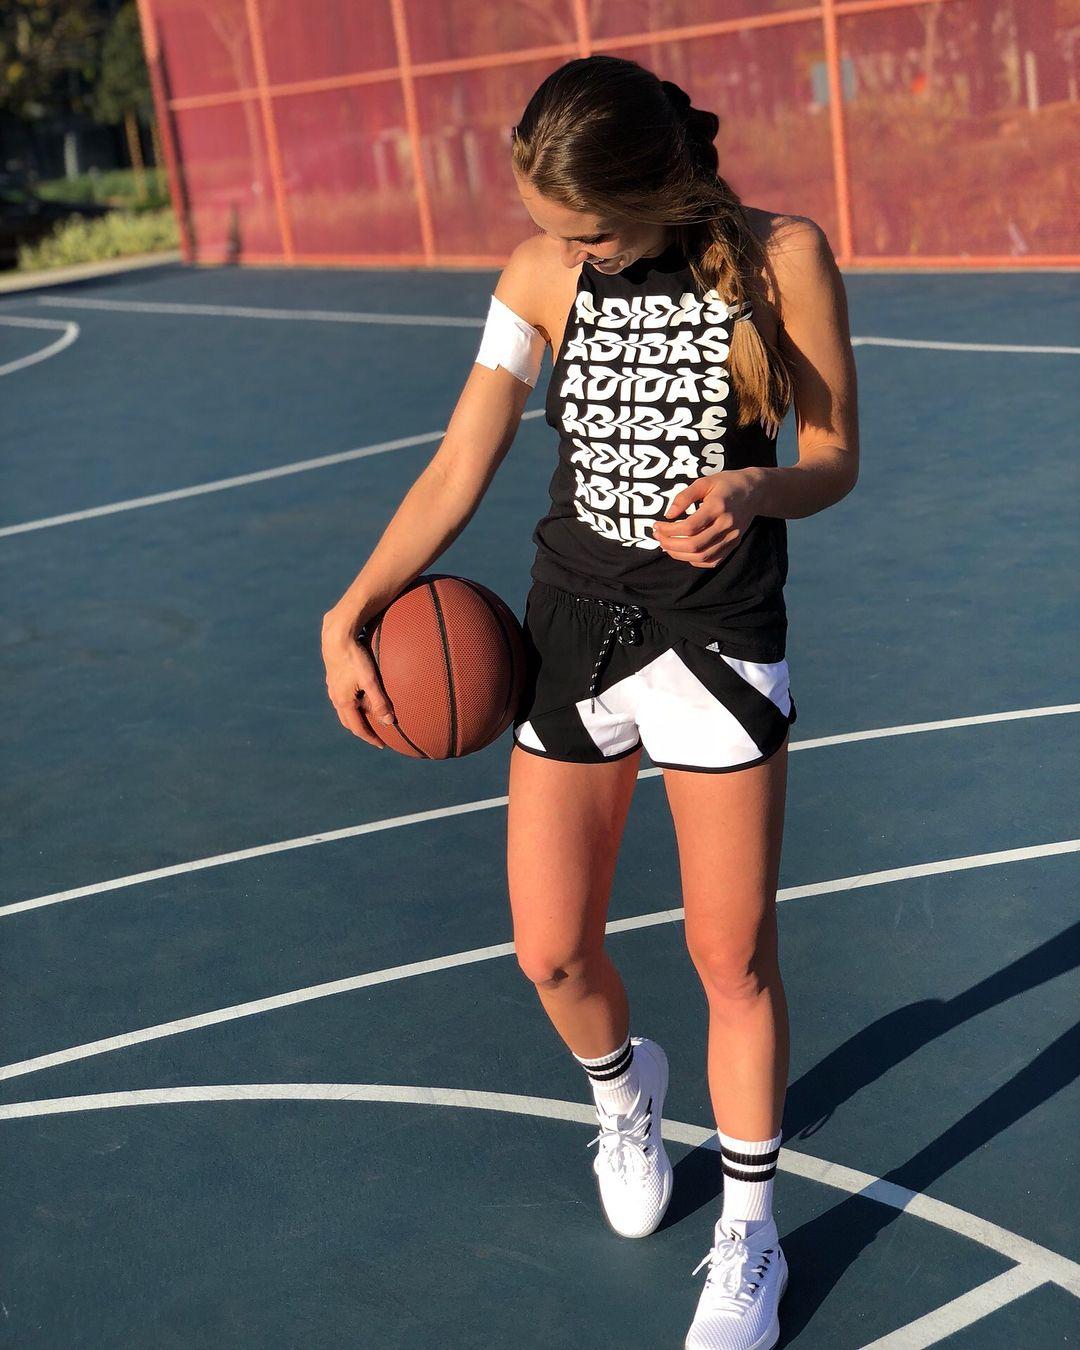 basquebol Instagram posts (photos and videos)